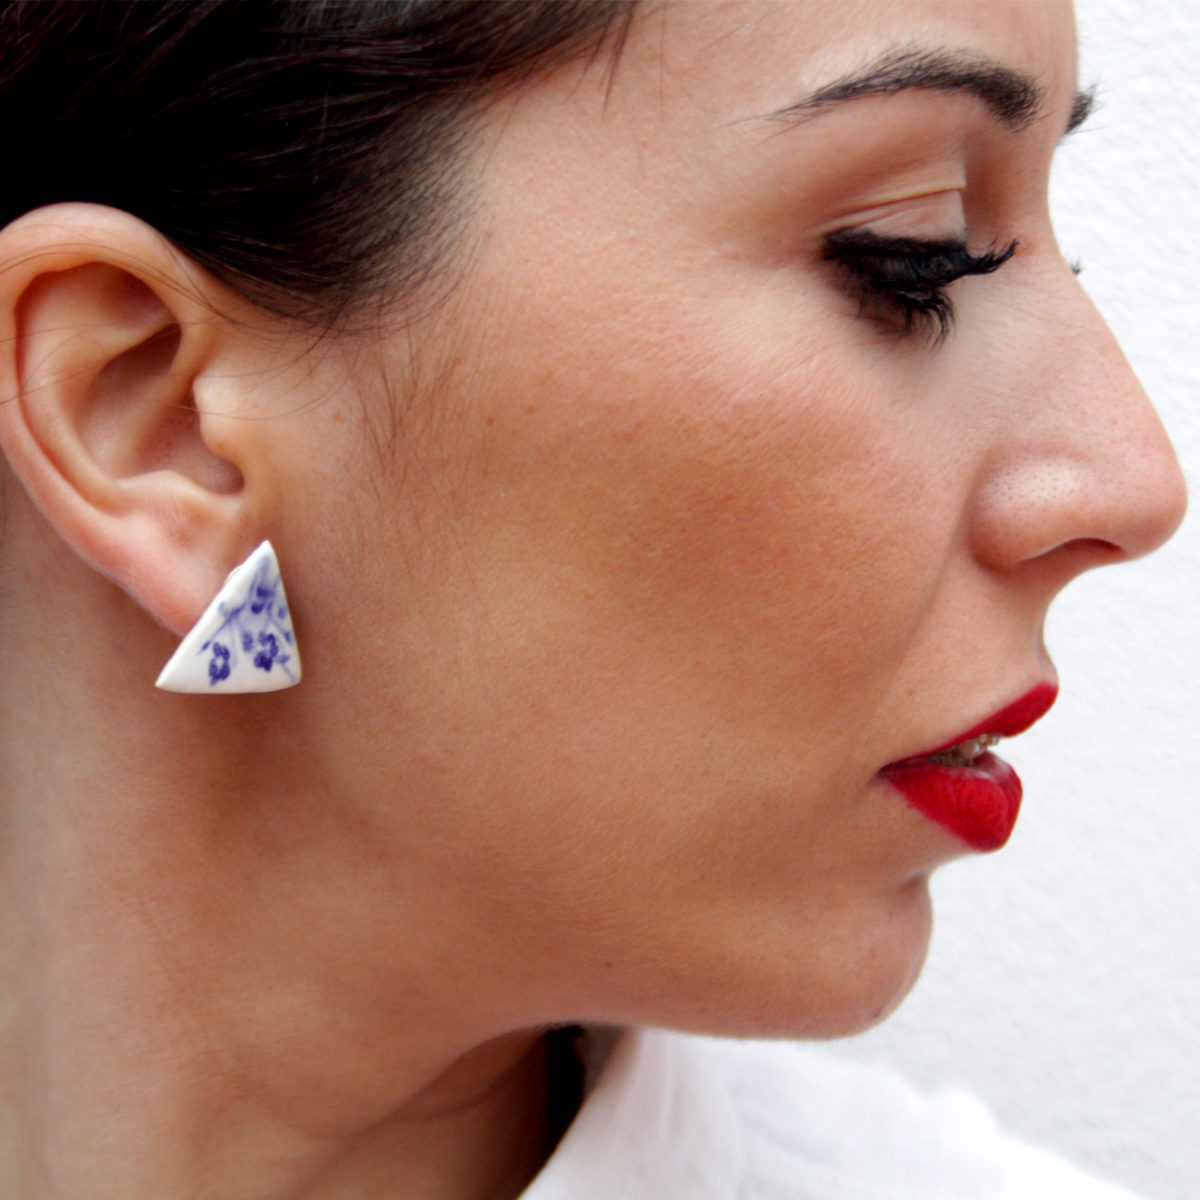 Pendientes de cerámica en triangulo minimalista Bowtery La Rambla flores azul y blanco Handmade ceramic earrings triangle minimalist blue and White flowers